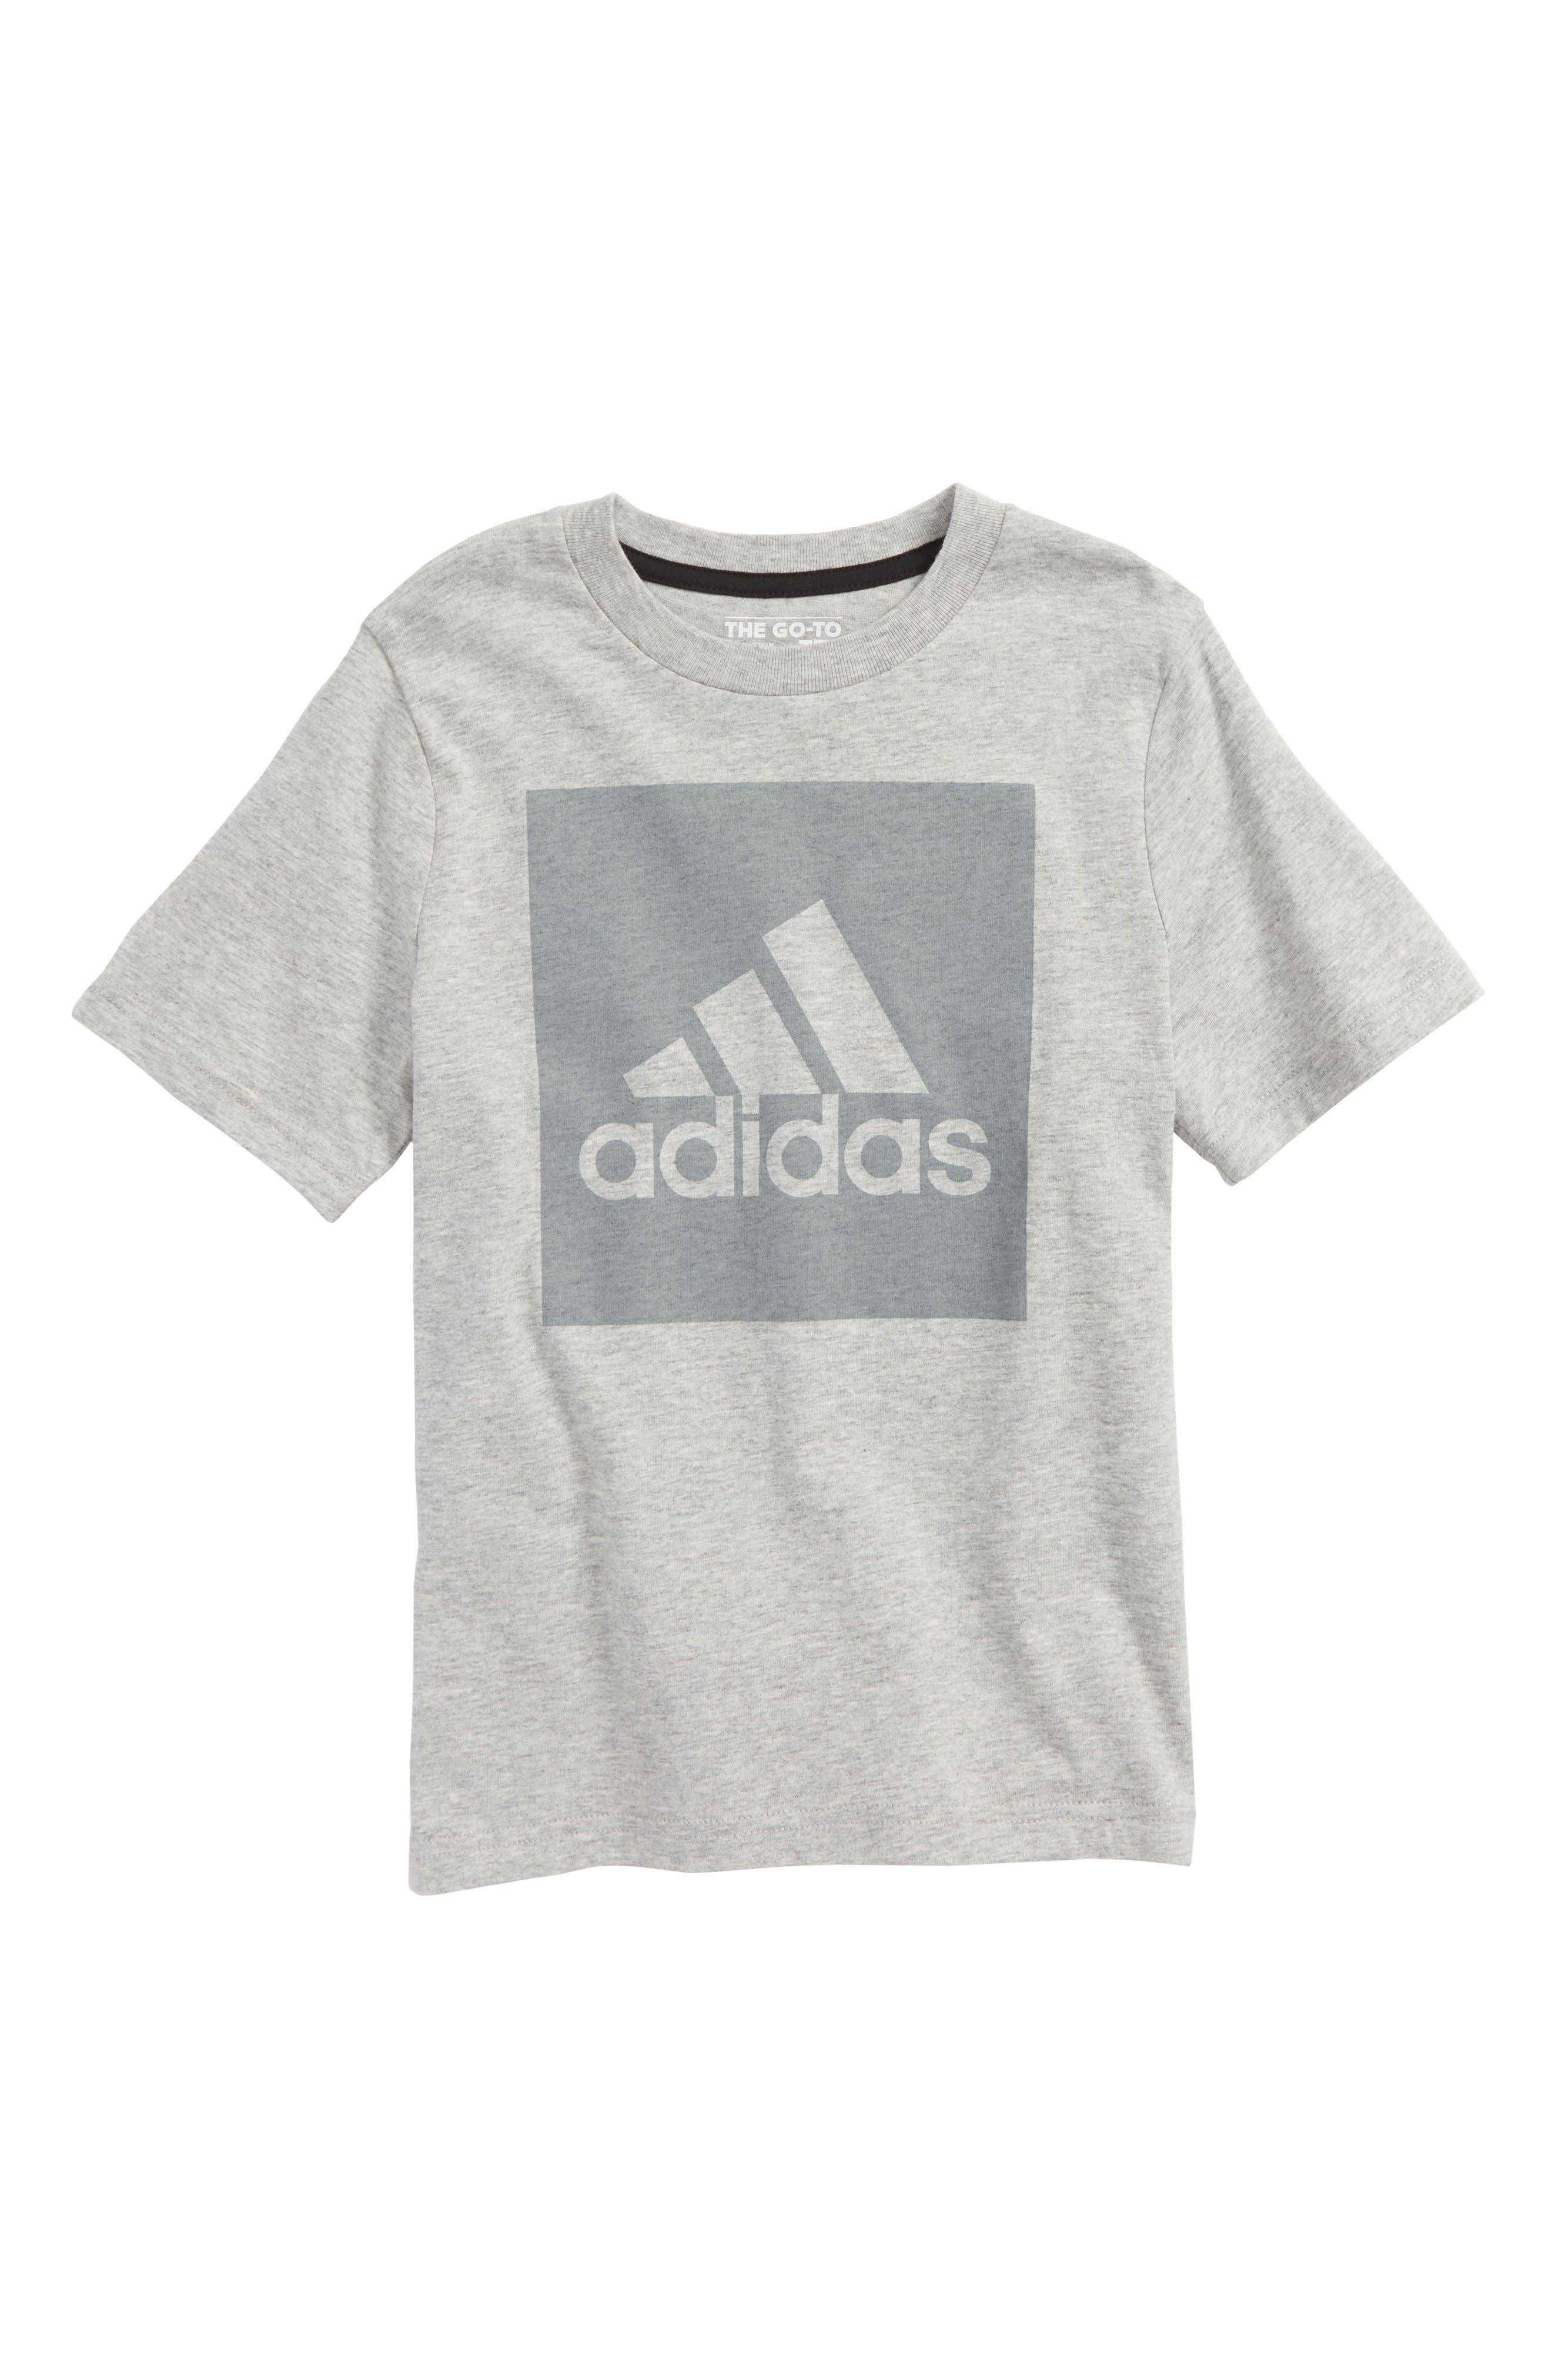 adidas Logo Graphic T-Shirt (Toddler Boys & Little Boys)